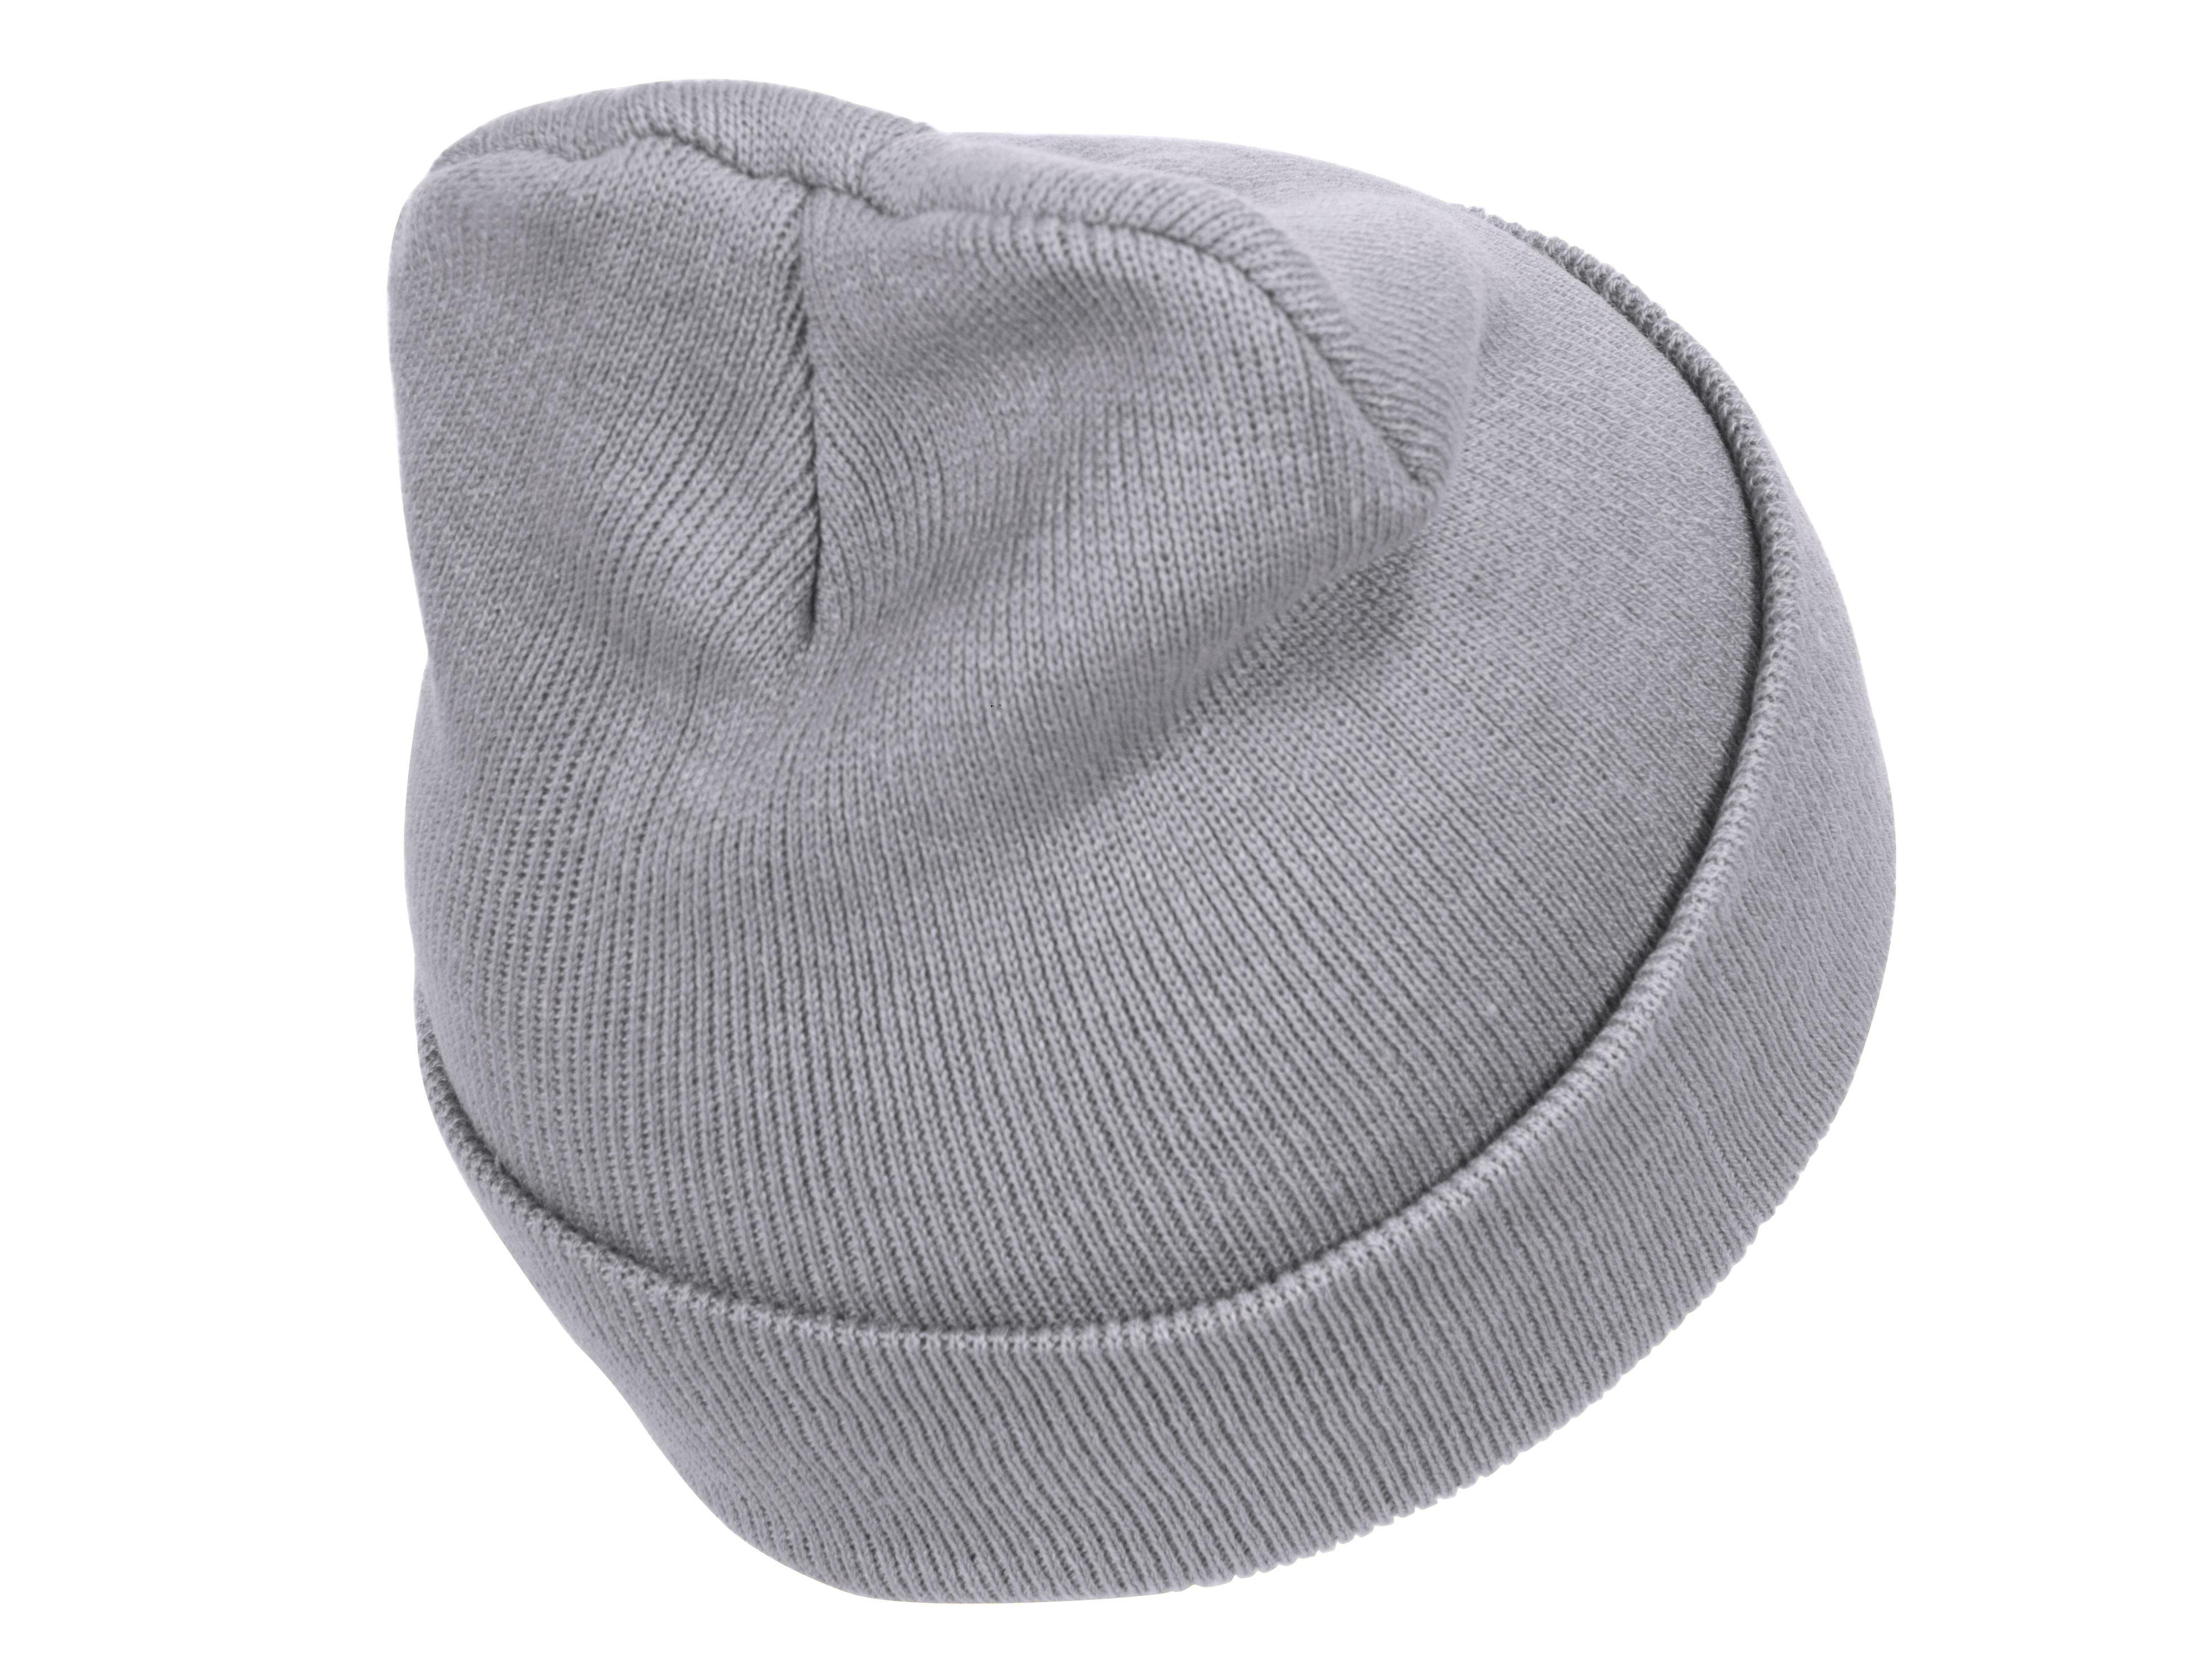 thumbnail 35 - Top Headwear Solid Winter Long Beanie - 12 Piece Wholesale